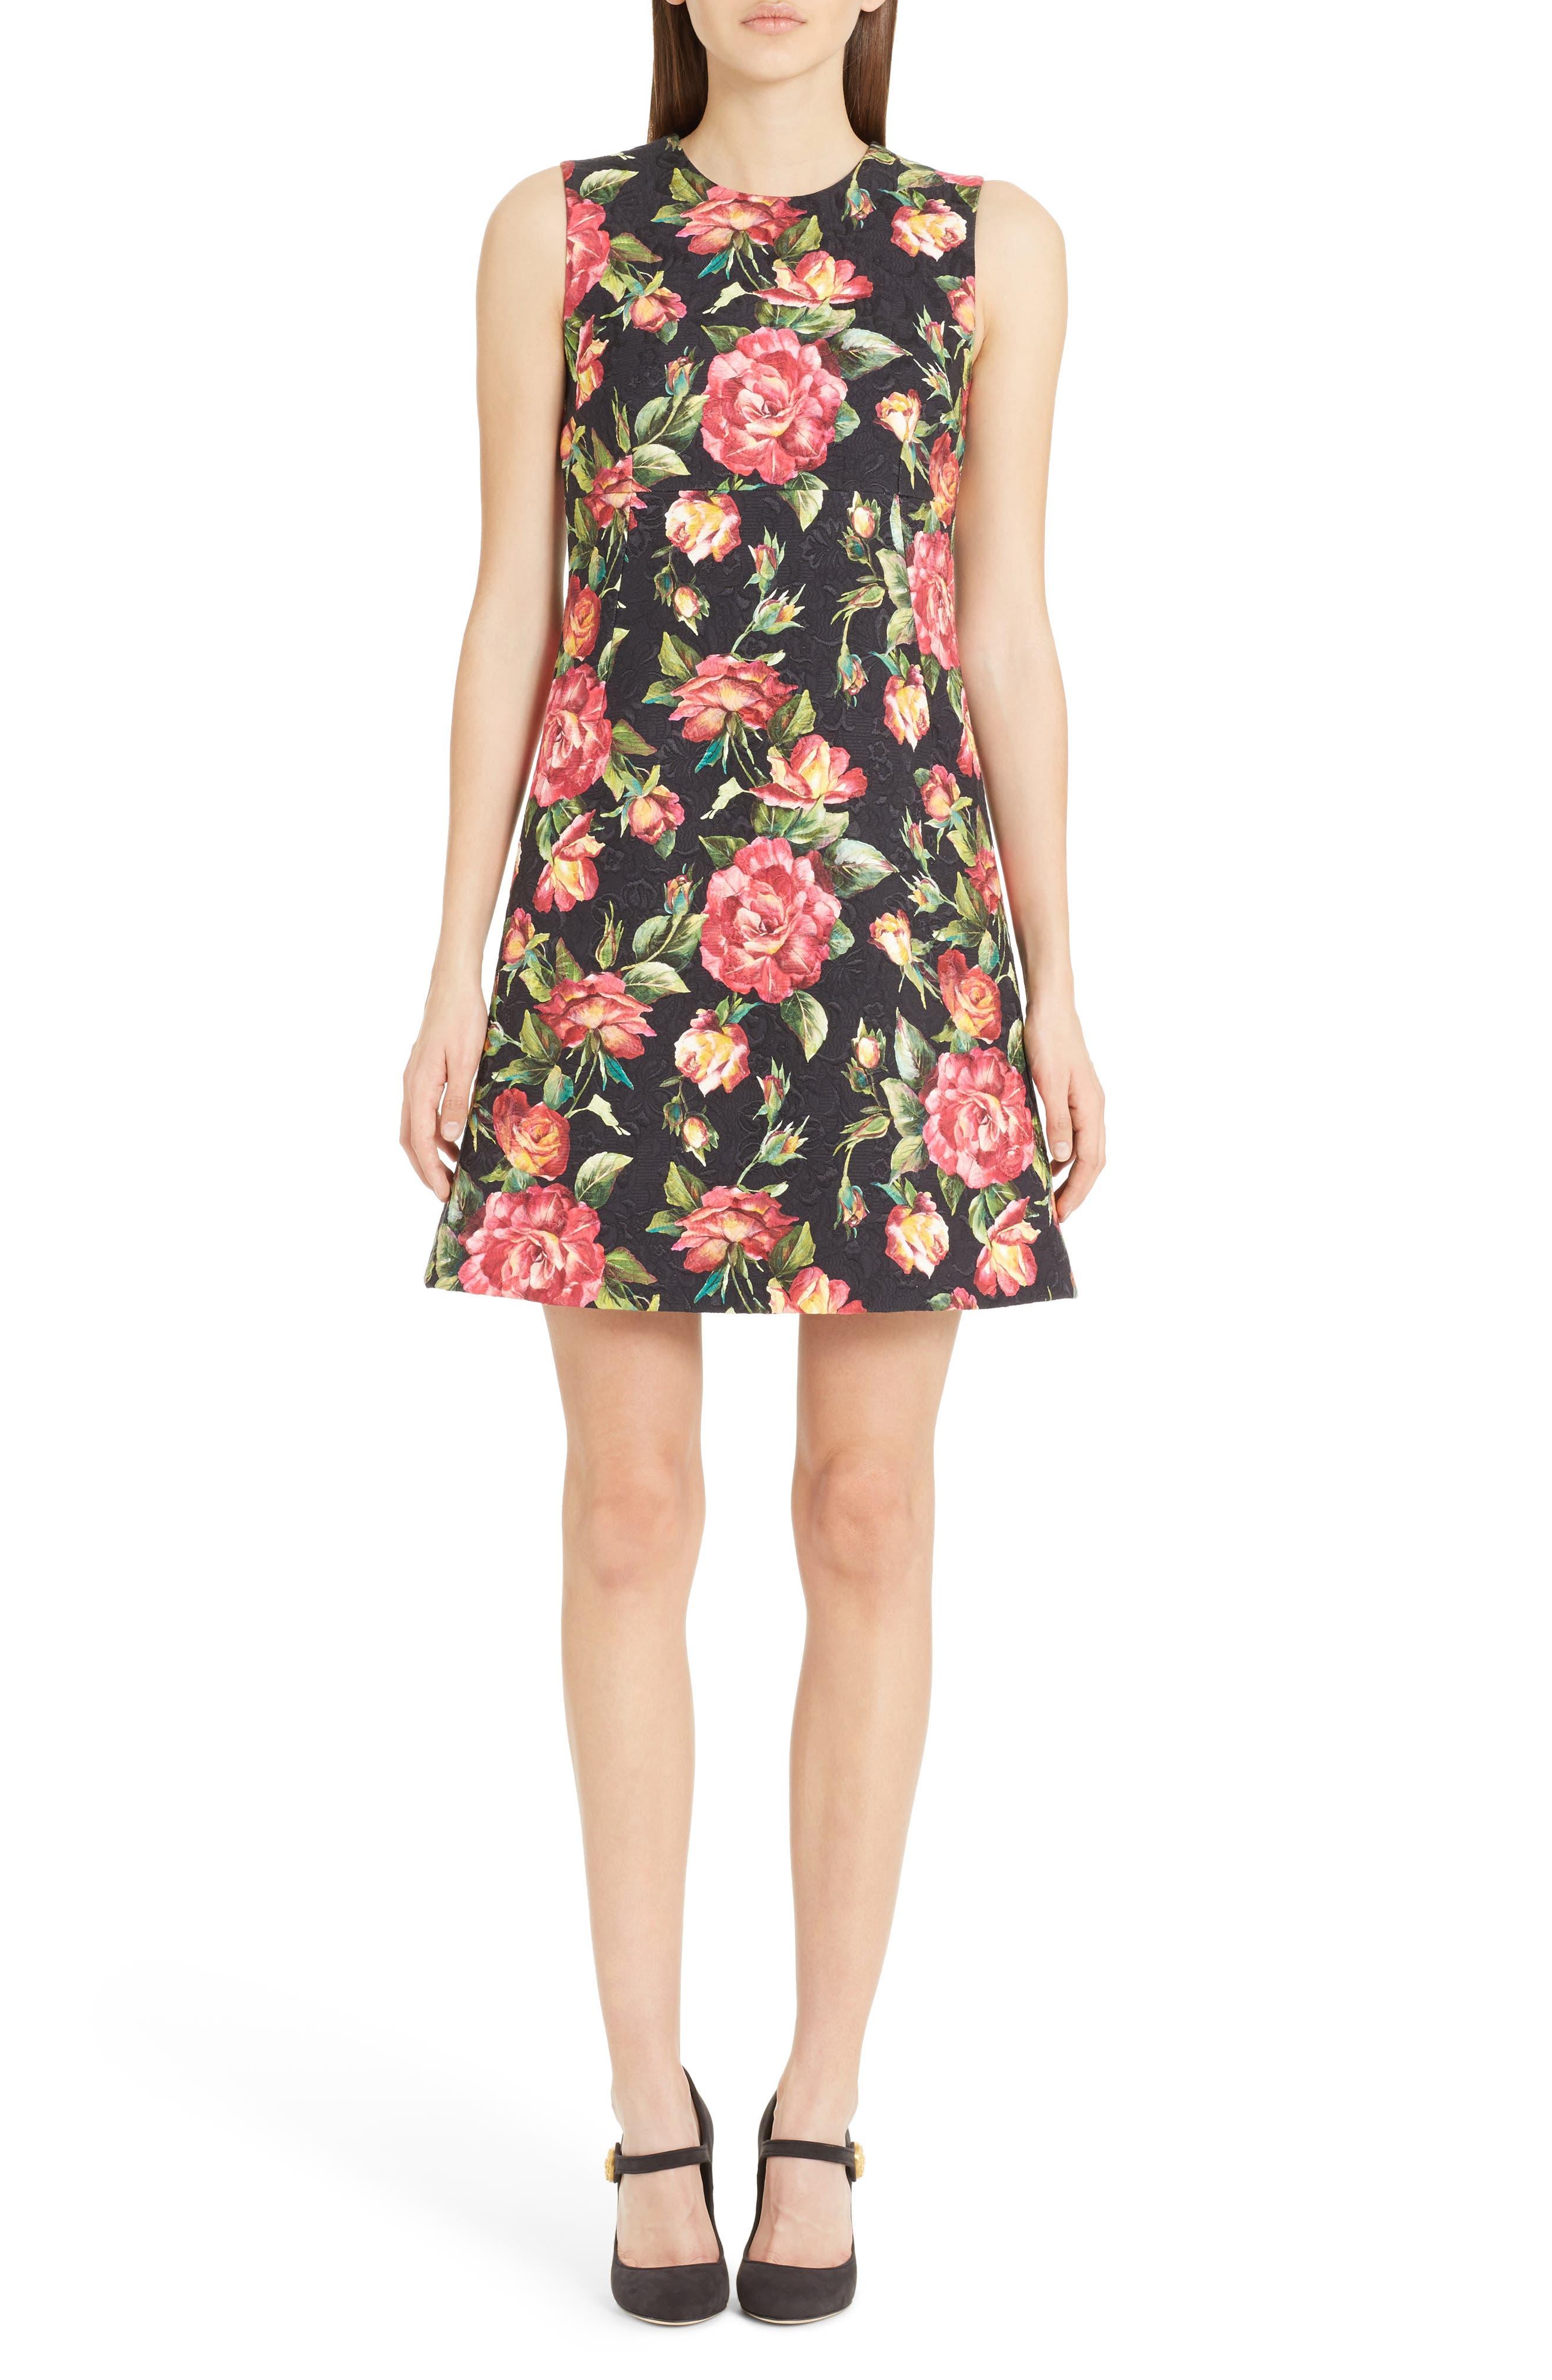 Dolce&Gabbana Rose Print Brocade A-Line Dress